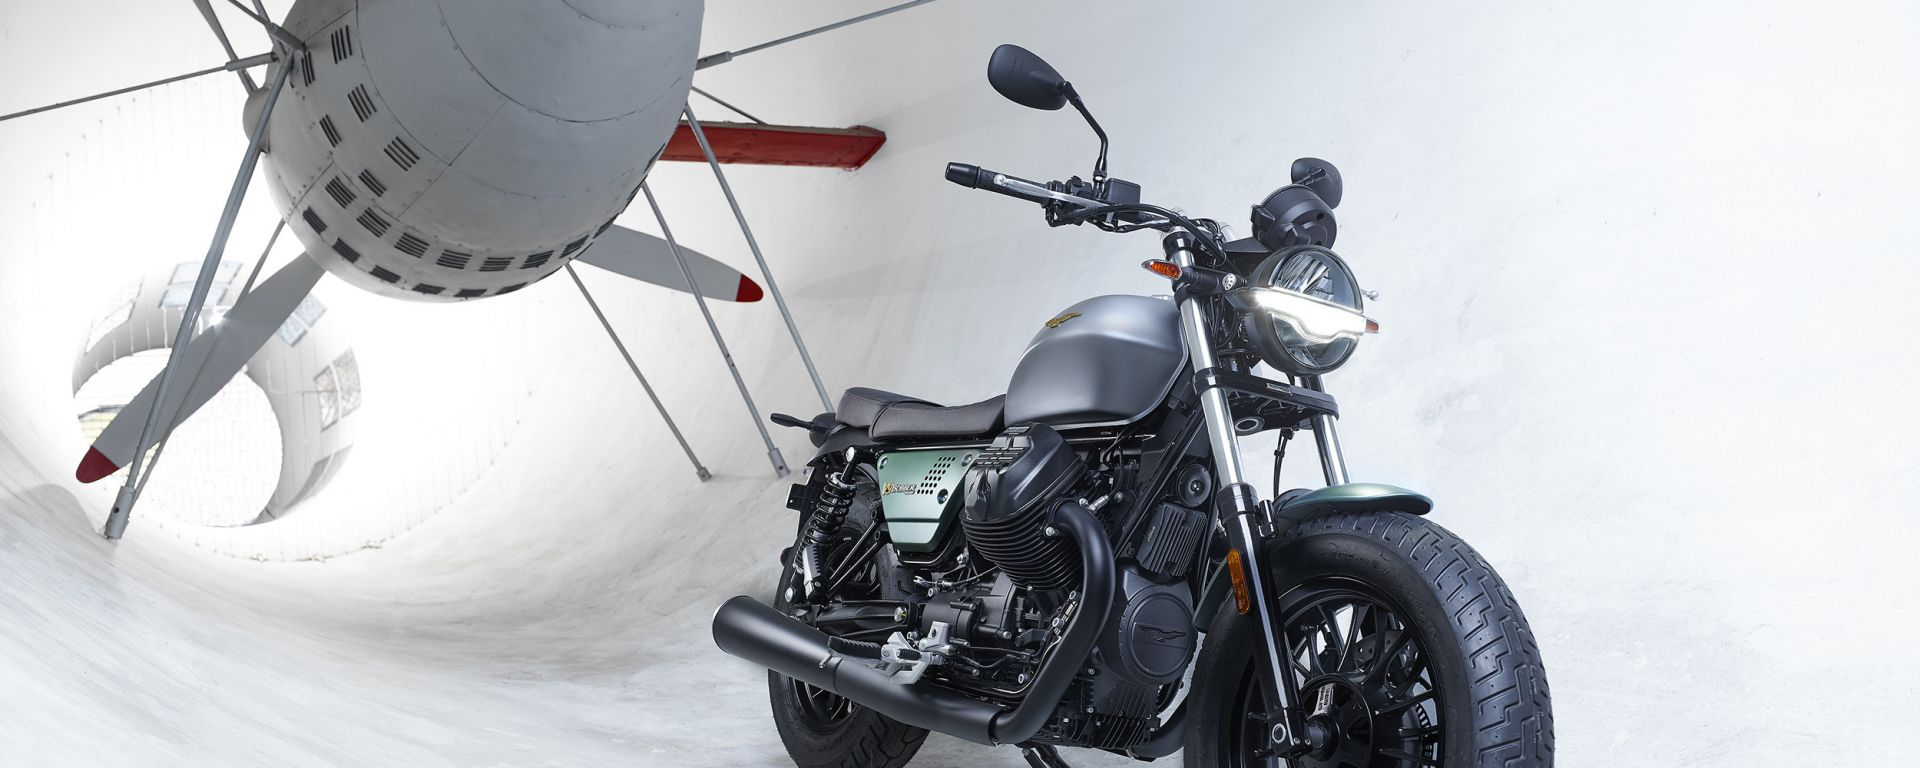 Moto Guzzi V9 Centenario